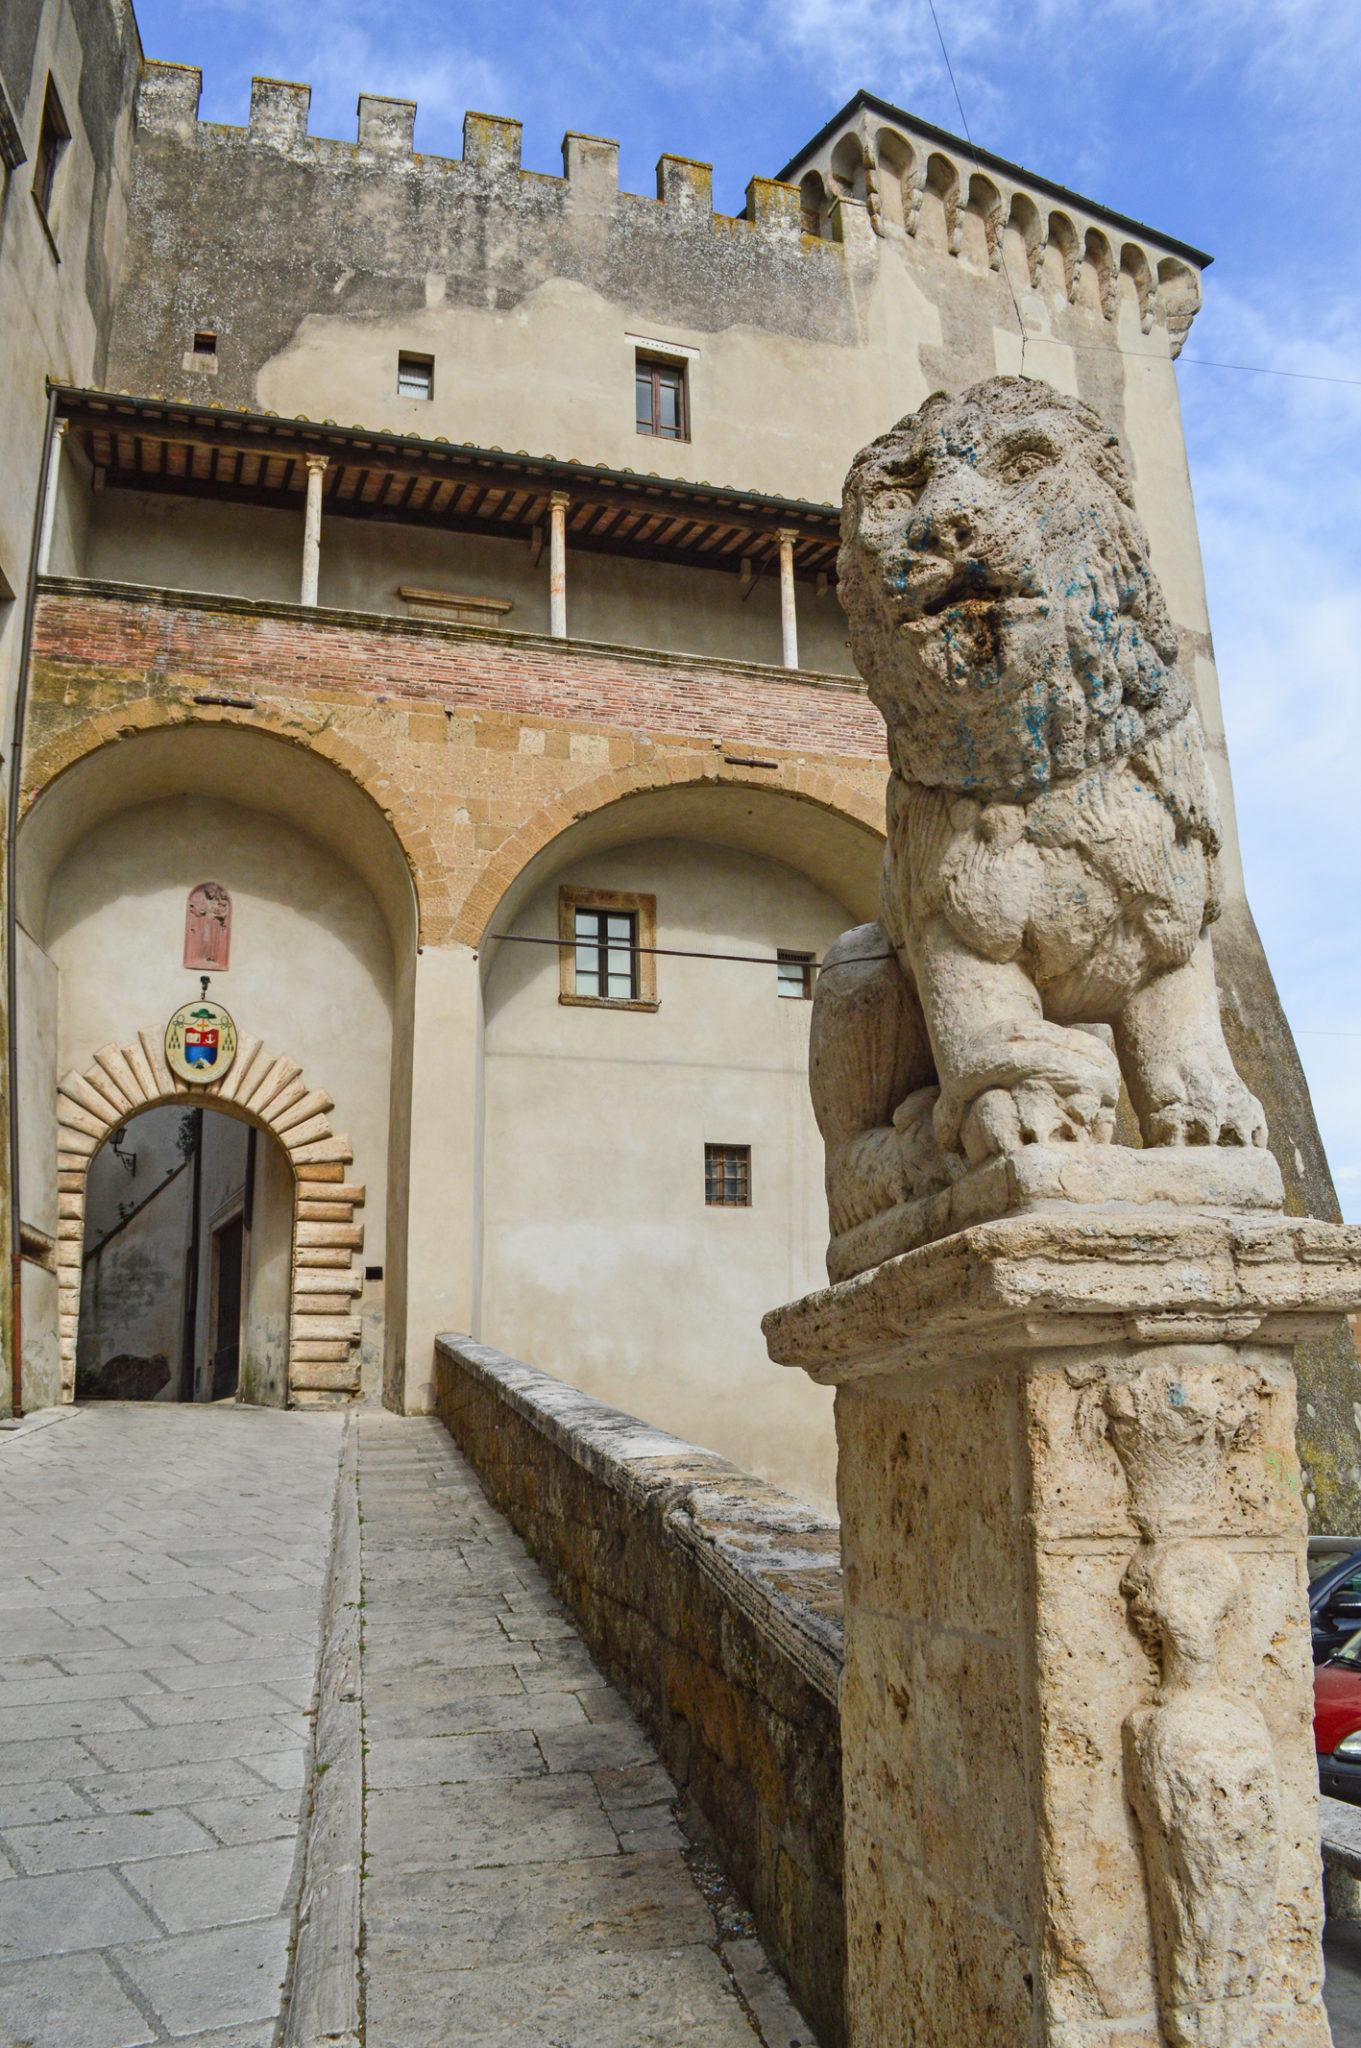 211 #WhereToGo: Pitigliano (Toscana)